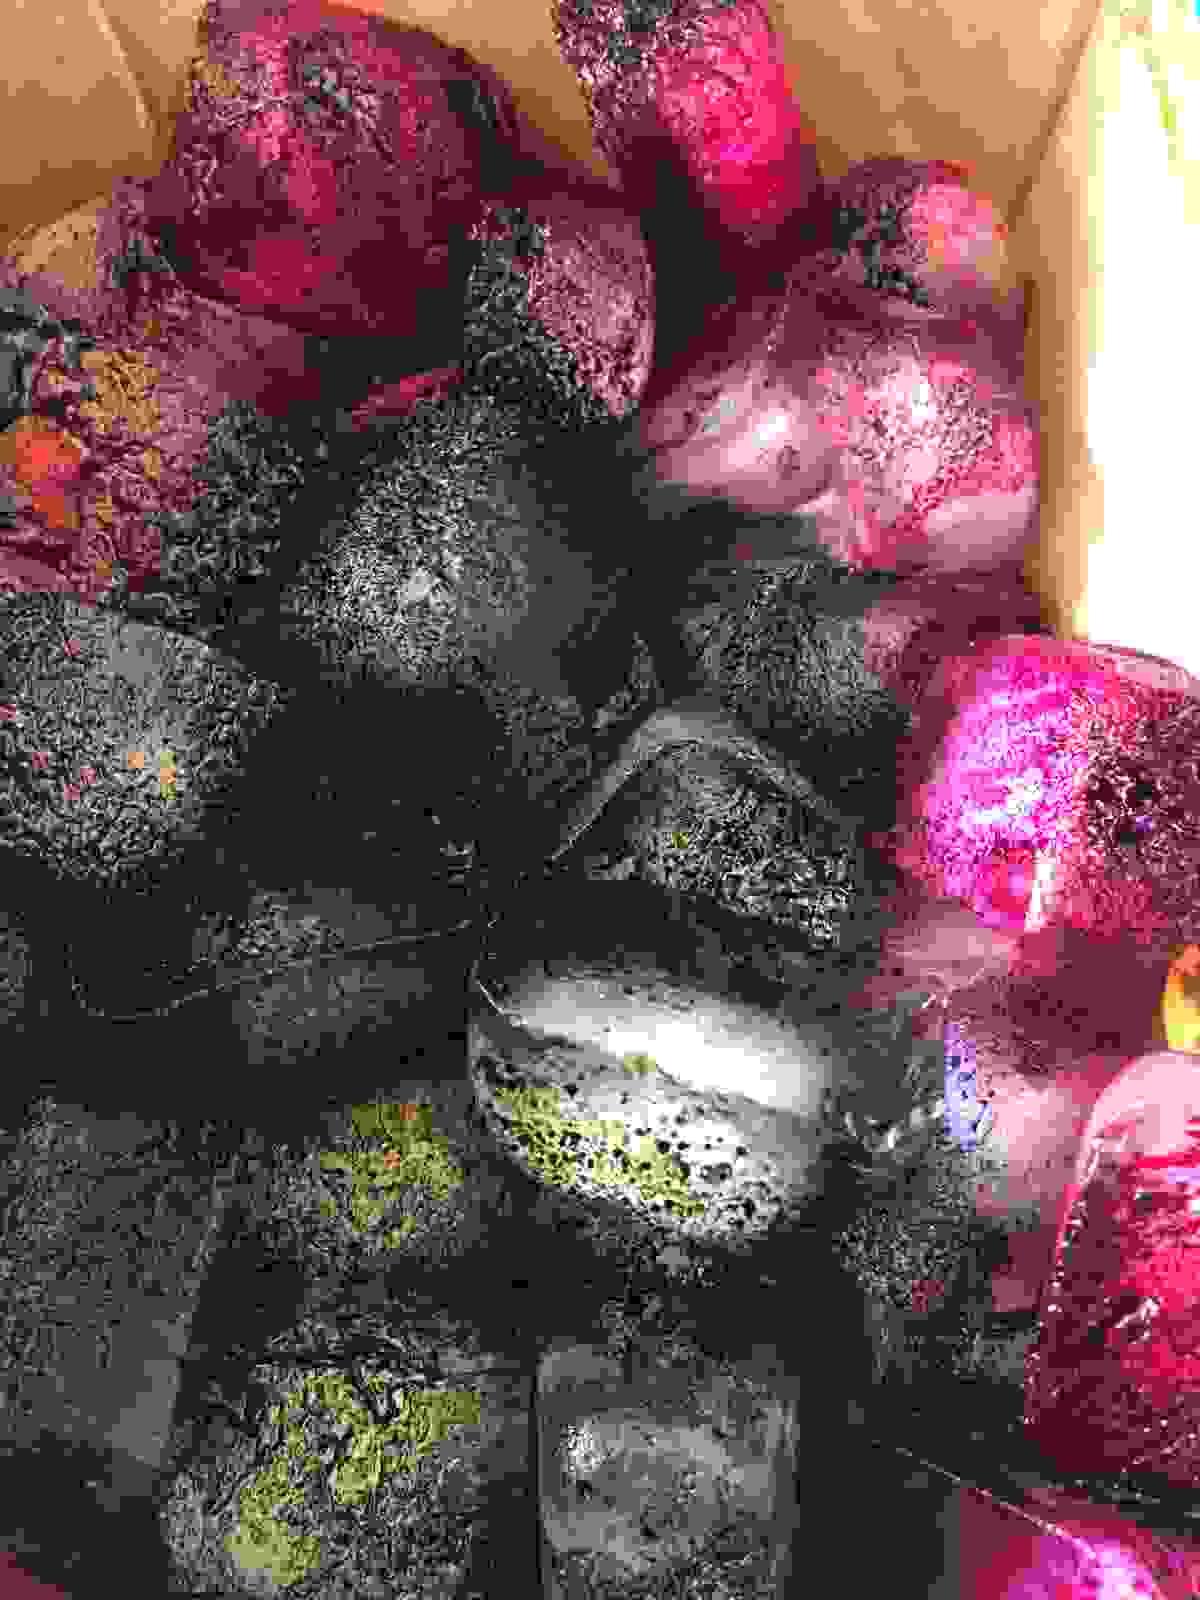 Procion Dye melting on the ice cubes